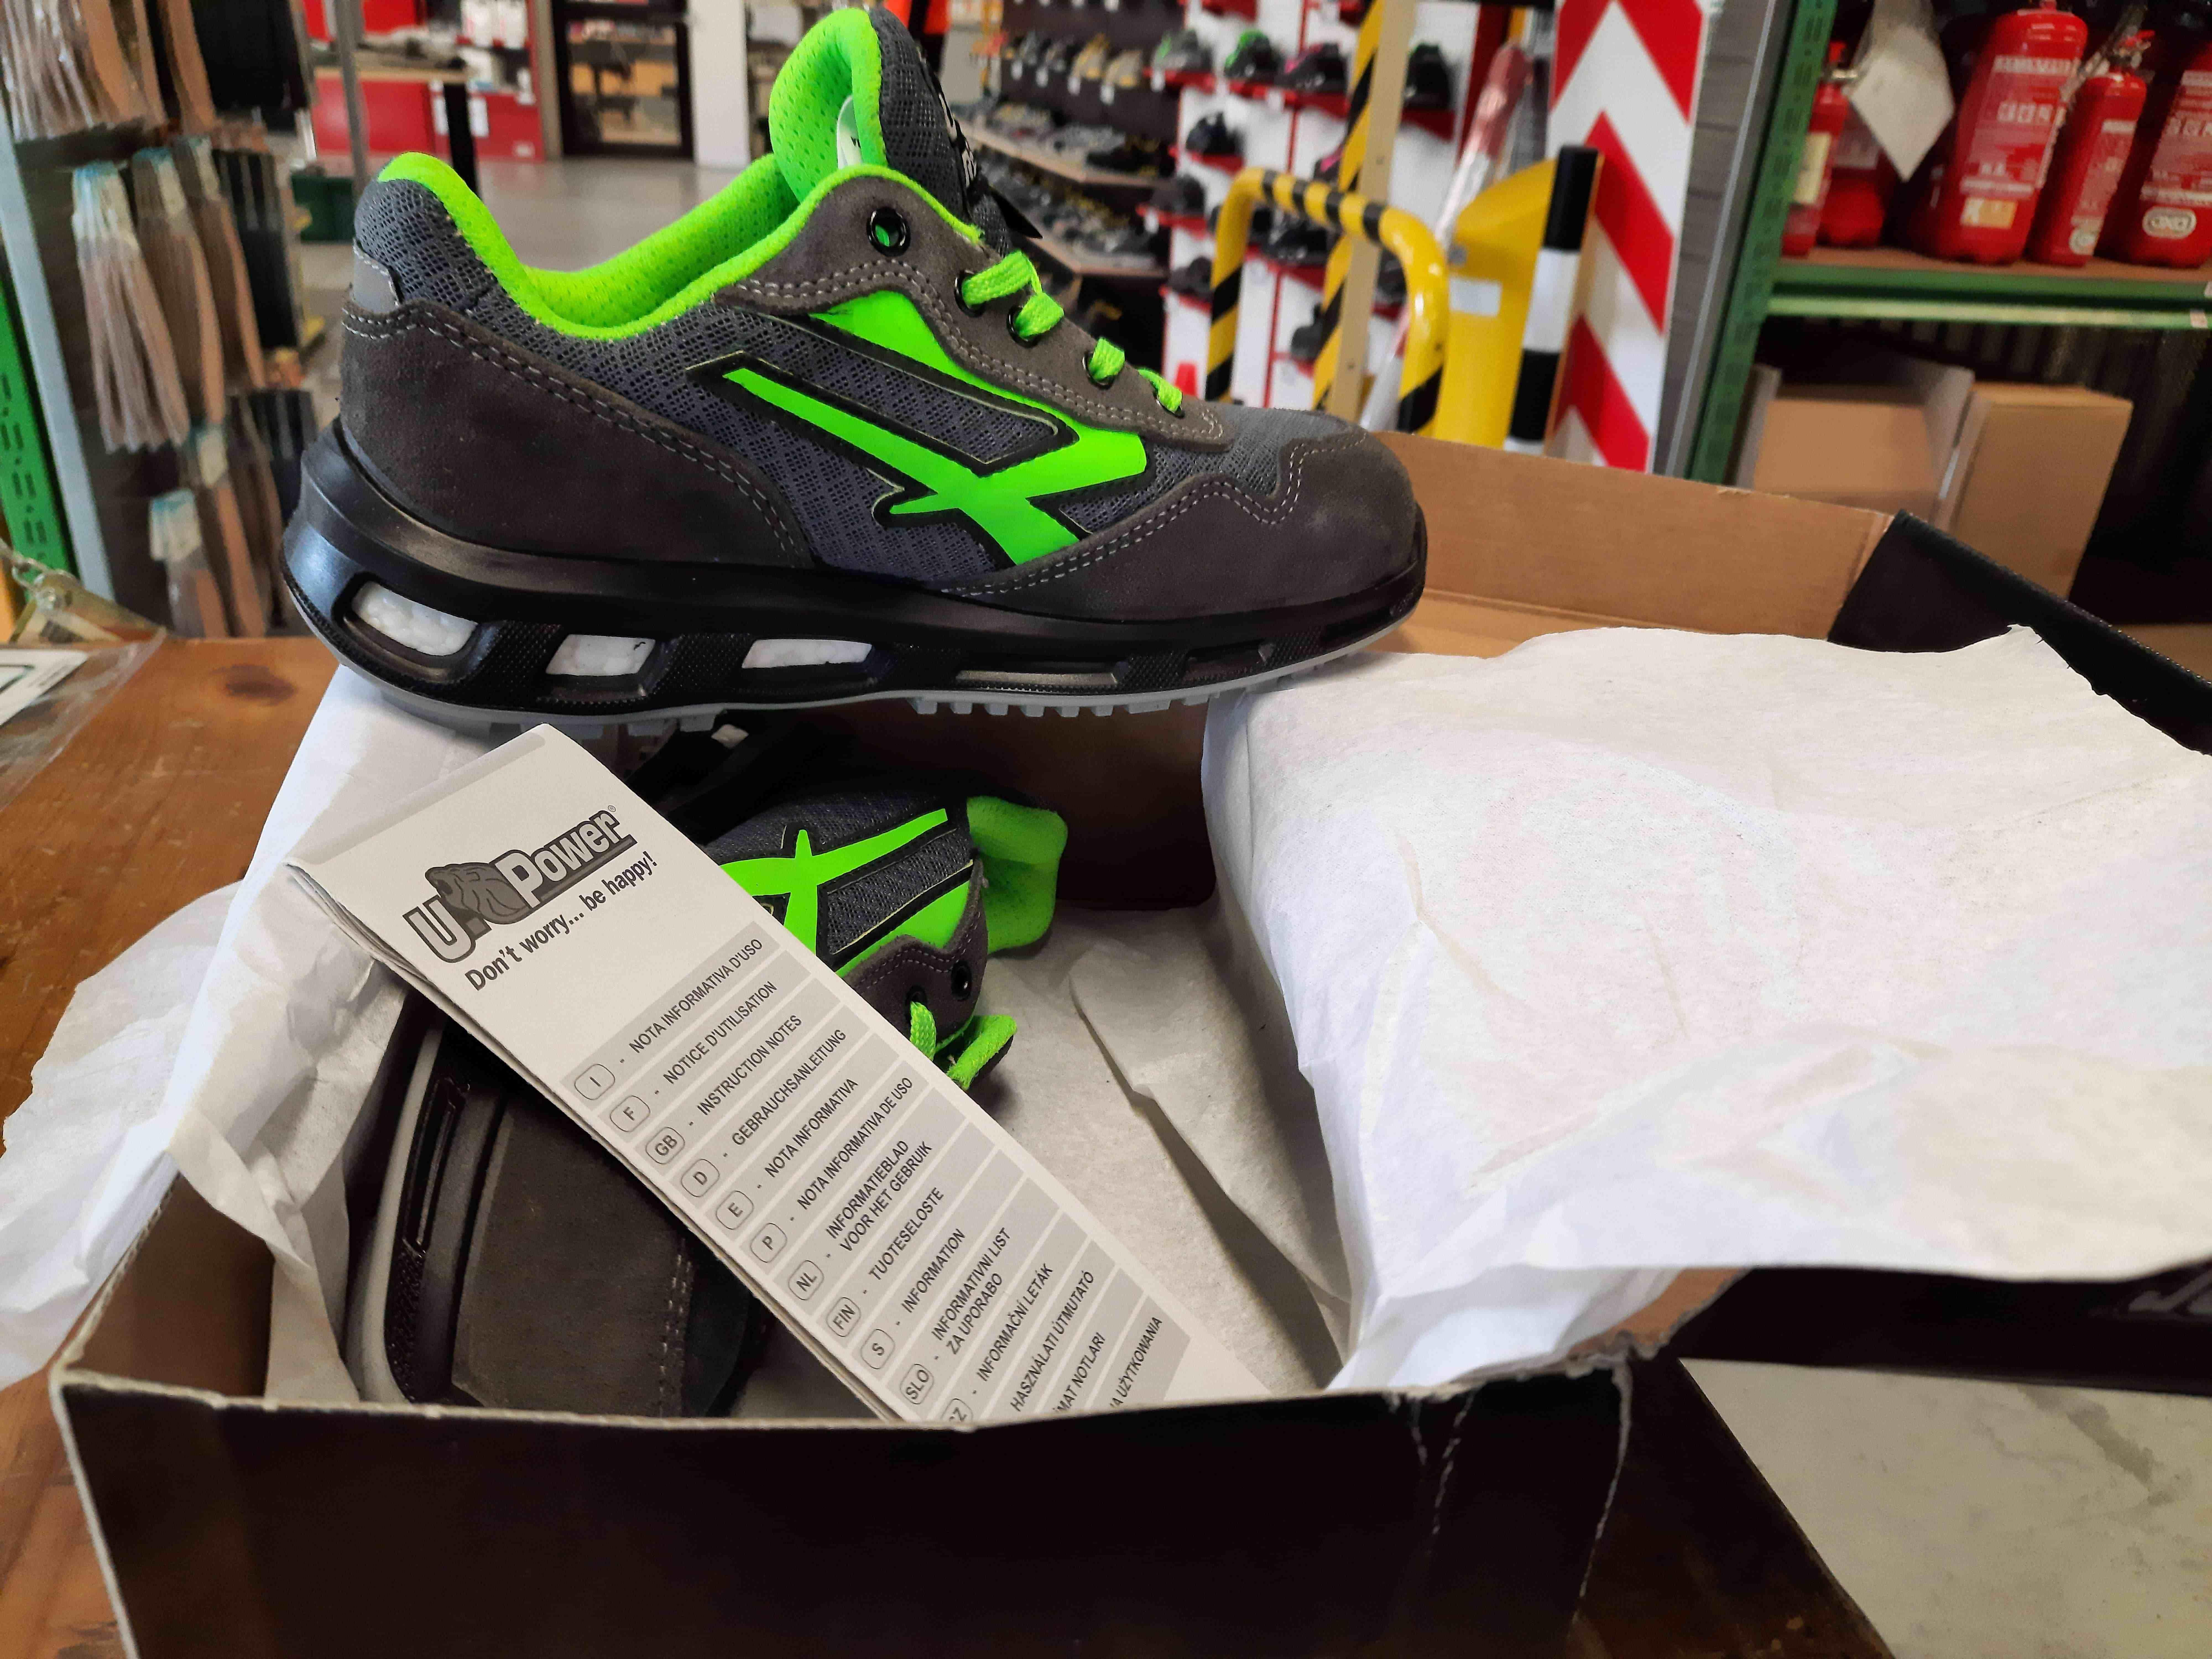 durata scarpe antinfortunistihe